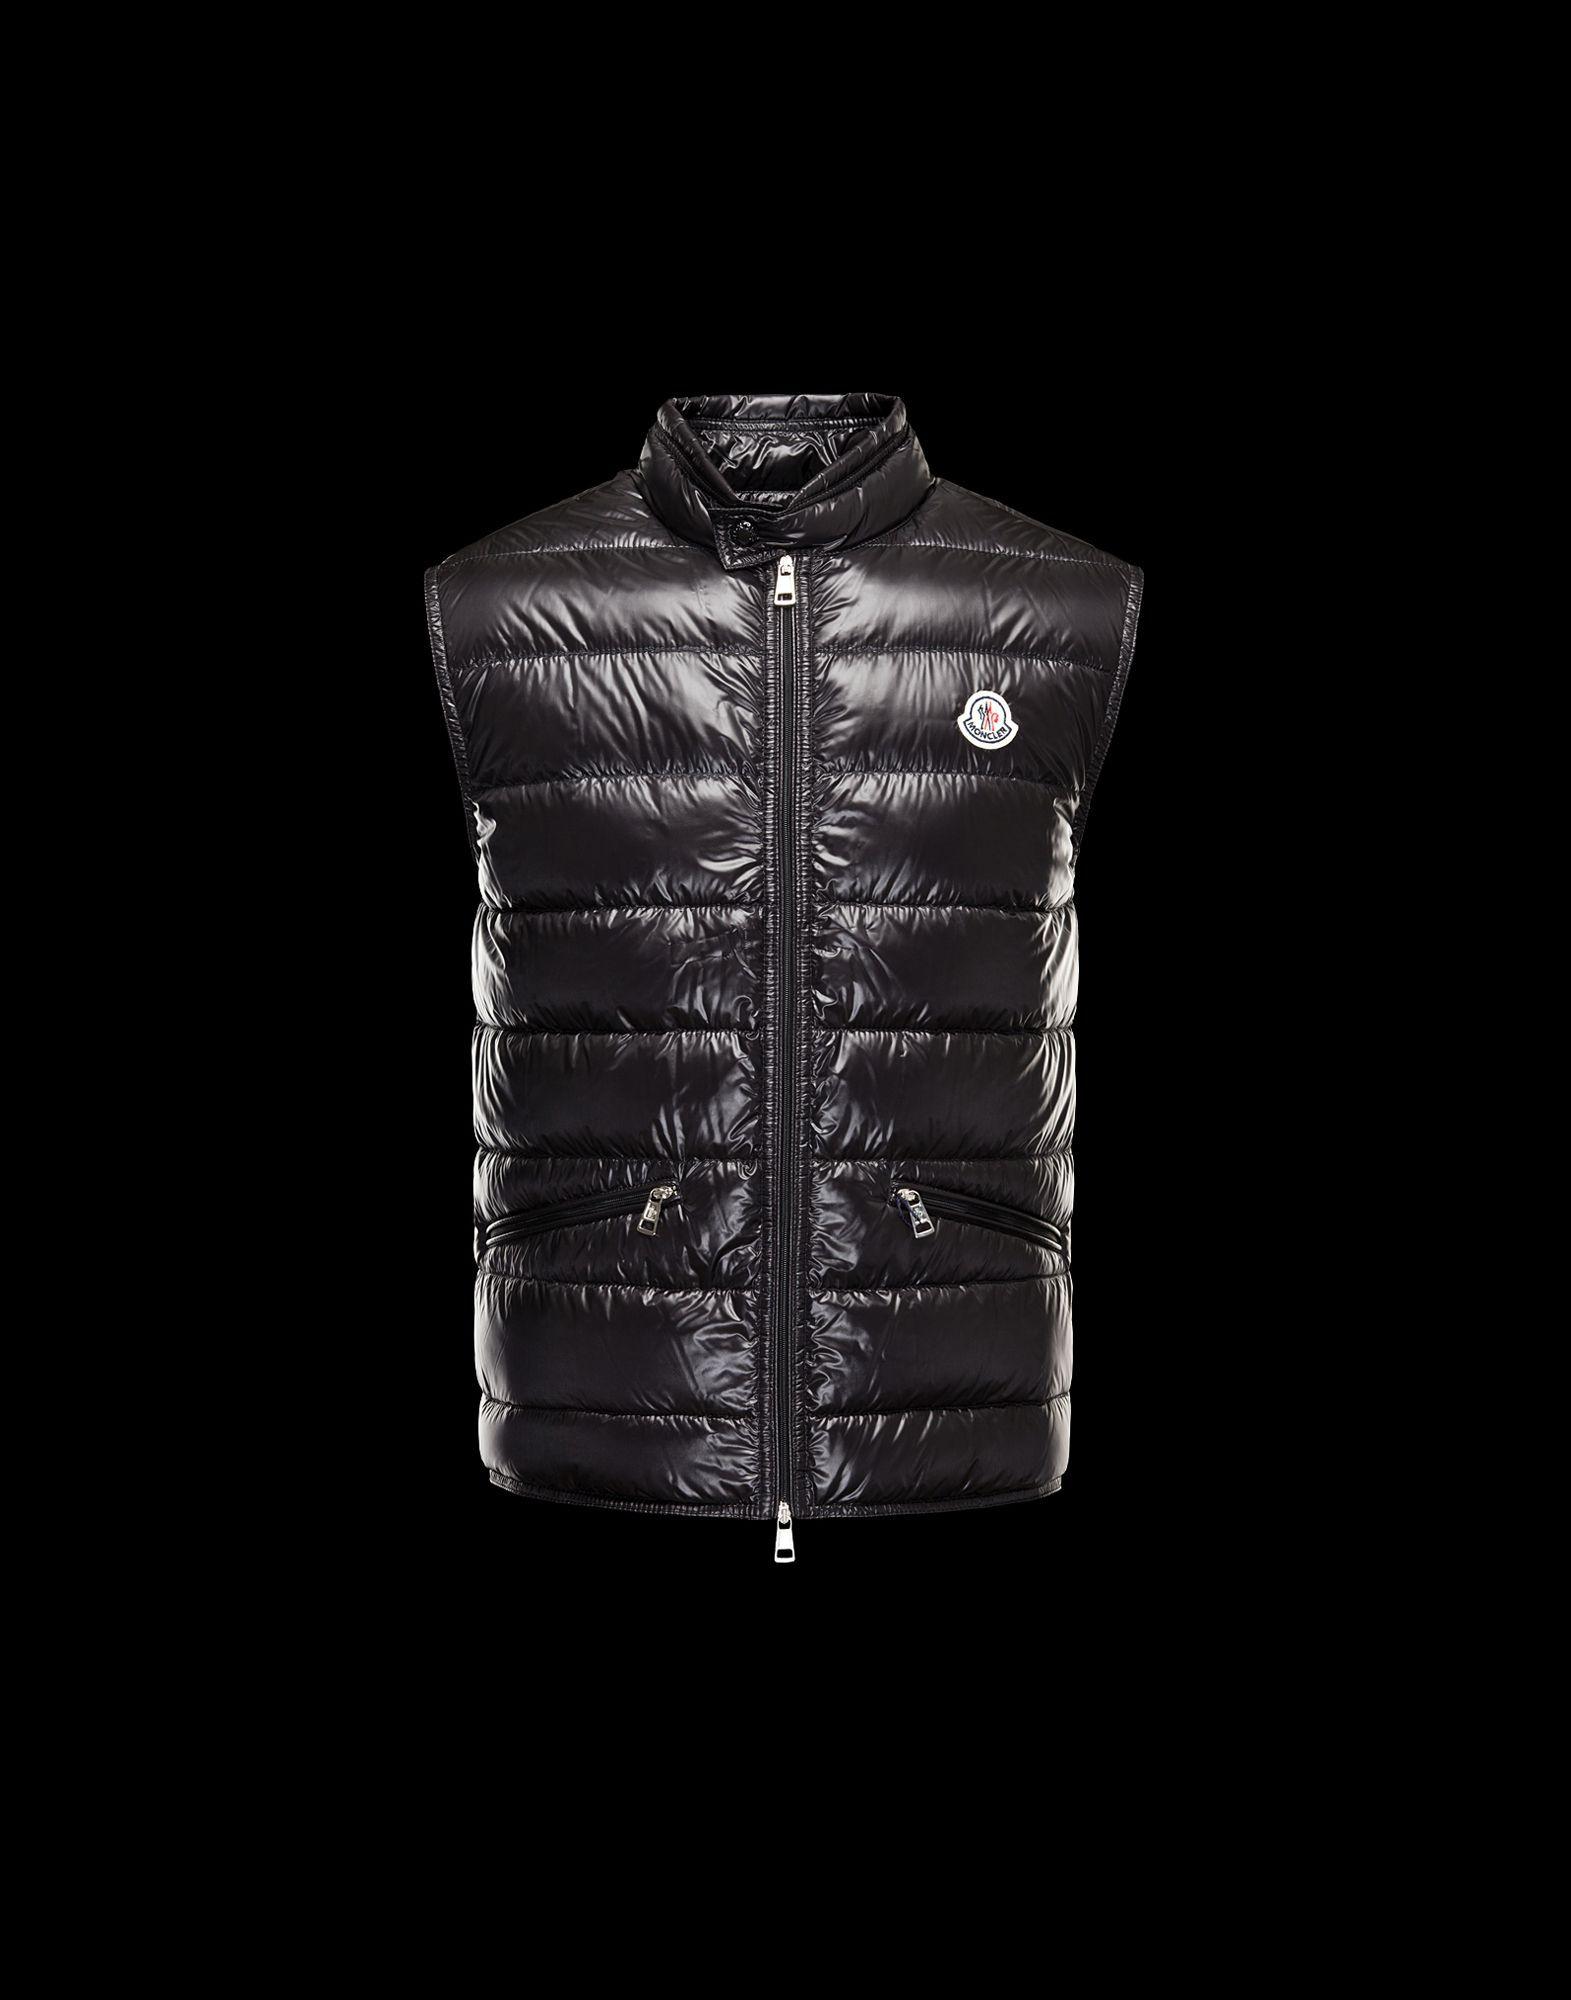 8c6b97c6c18b Moncler Online Store - Waistcoat Men